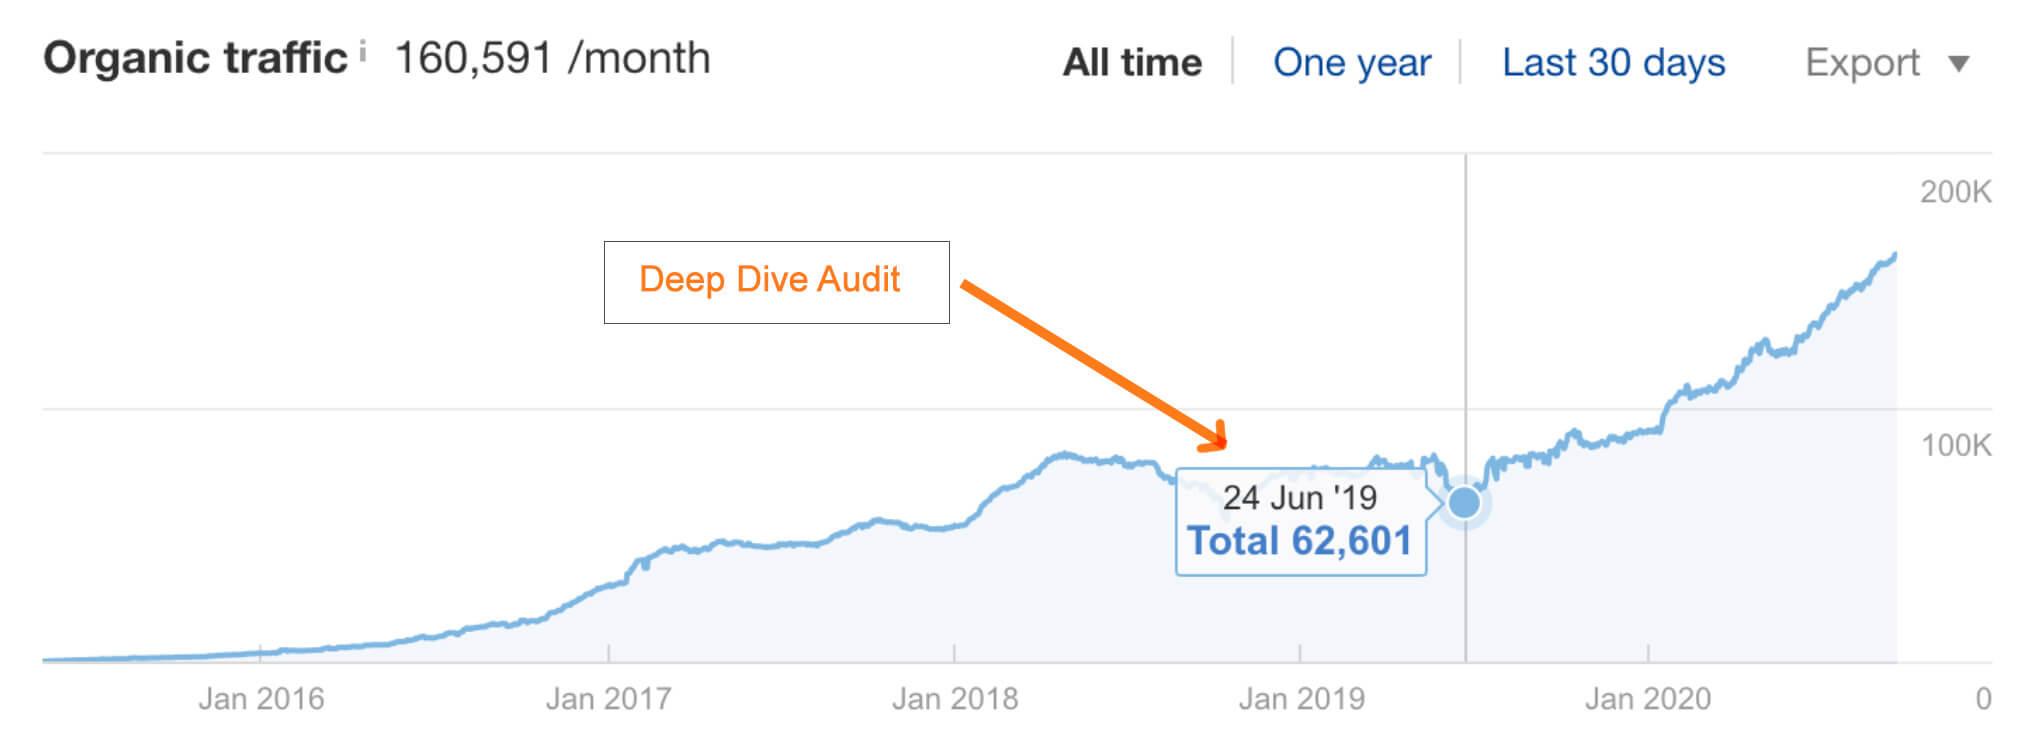 Deed Dive Audit effects